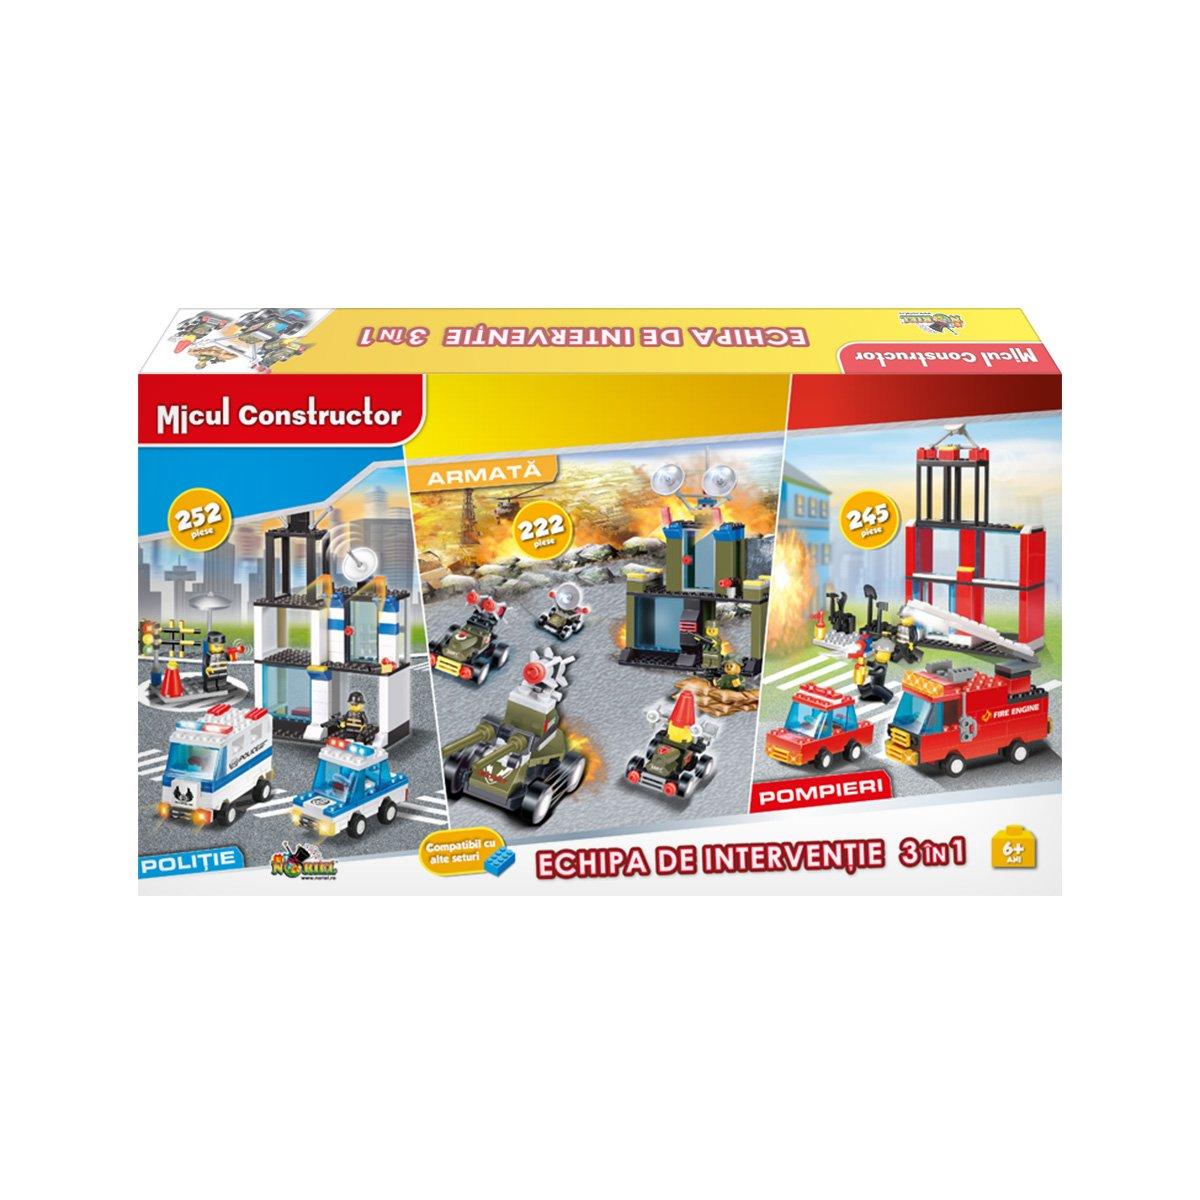 Jucarie de constructie Micul Constructor - Echipa de interventie 3 in 1